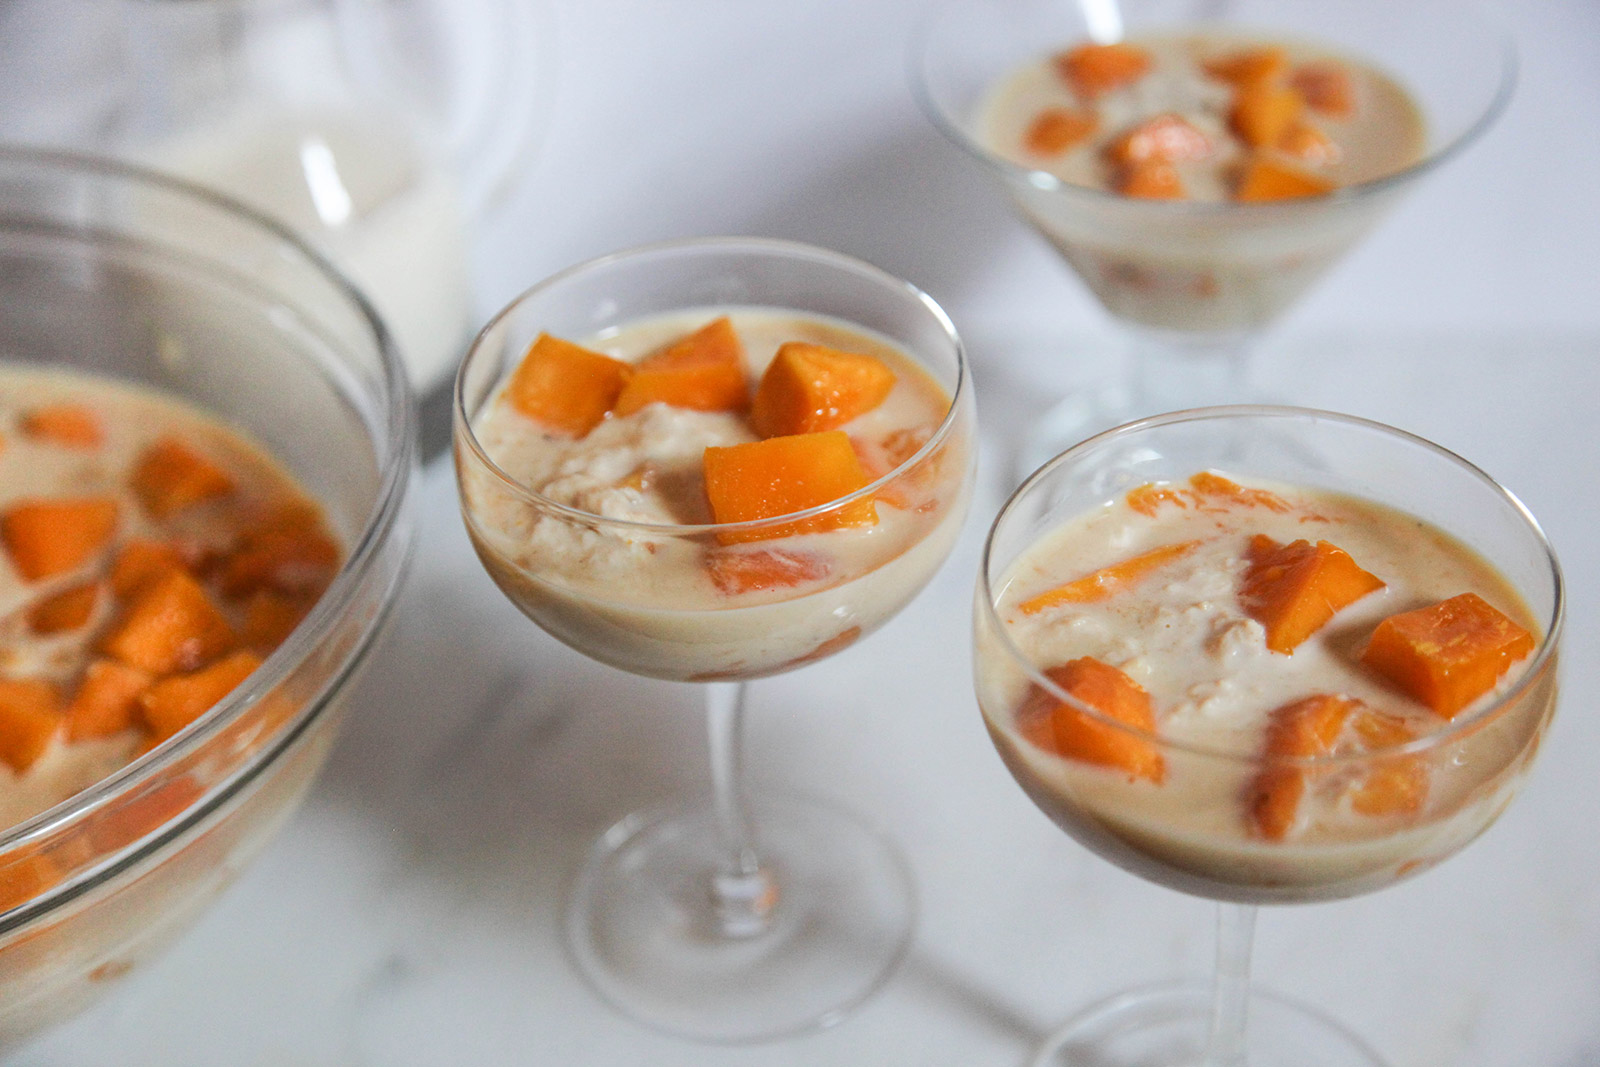 simple dessert of sweet mango in creamy milk